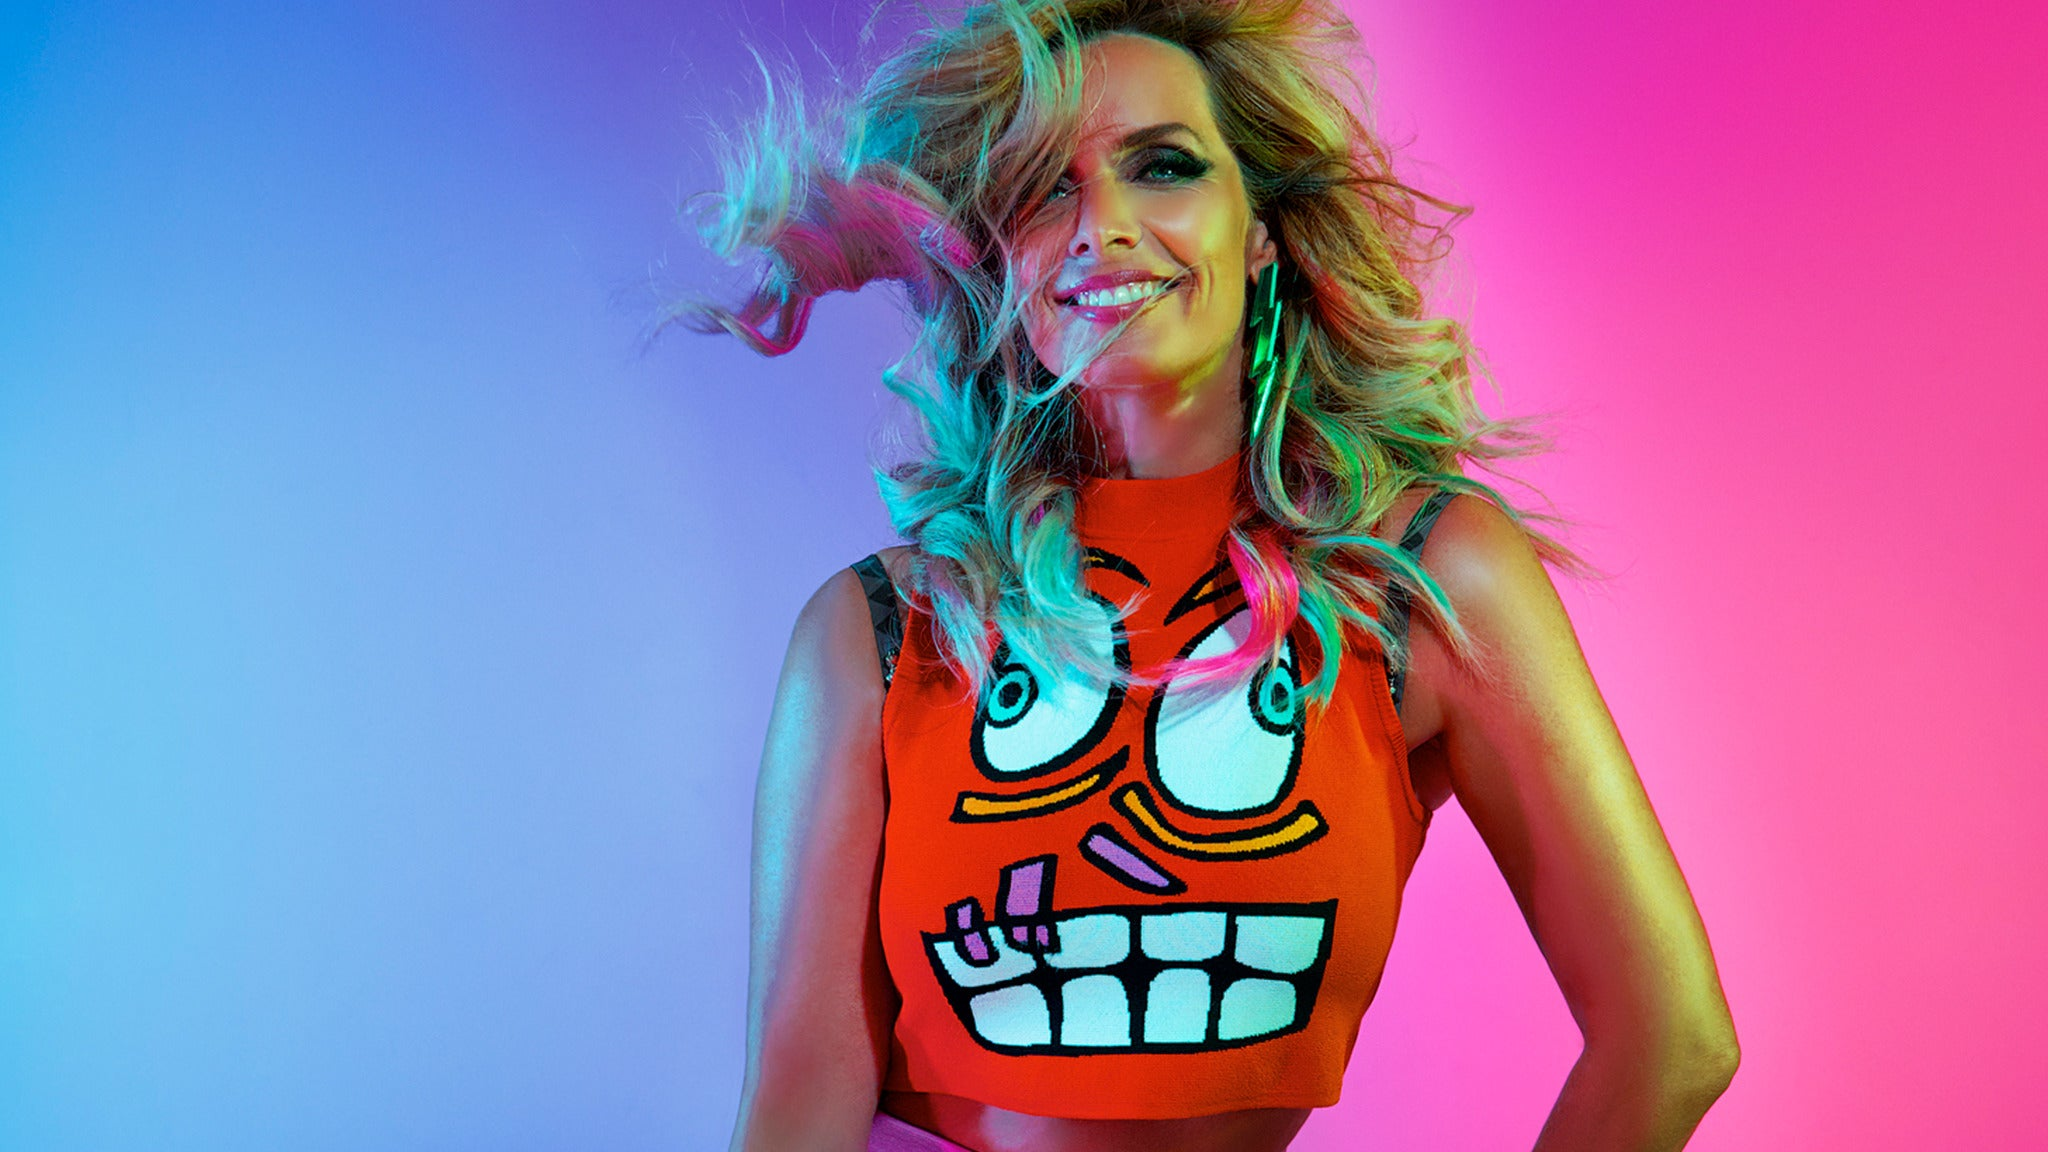 Candy Dulfer - Sax, Candy & Rock 'n Roll